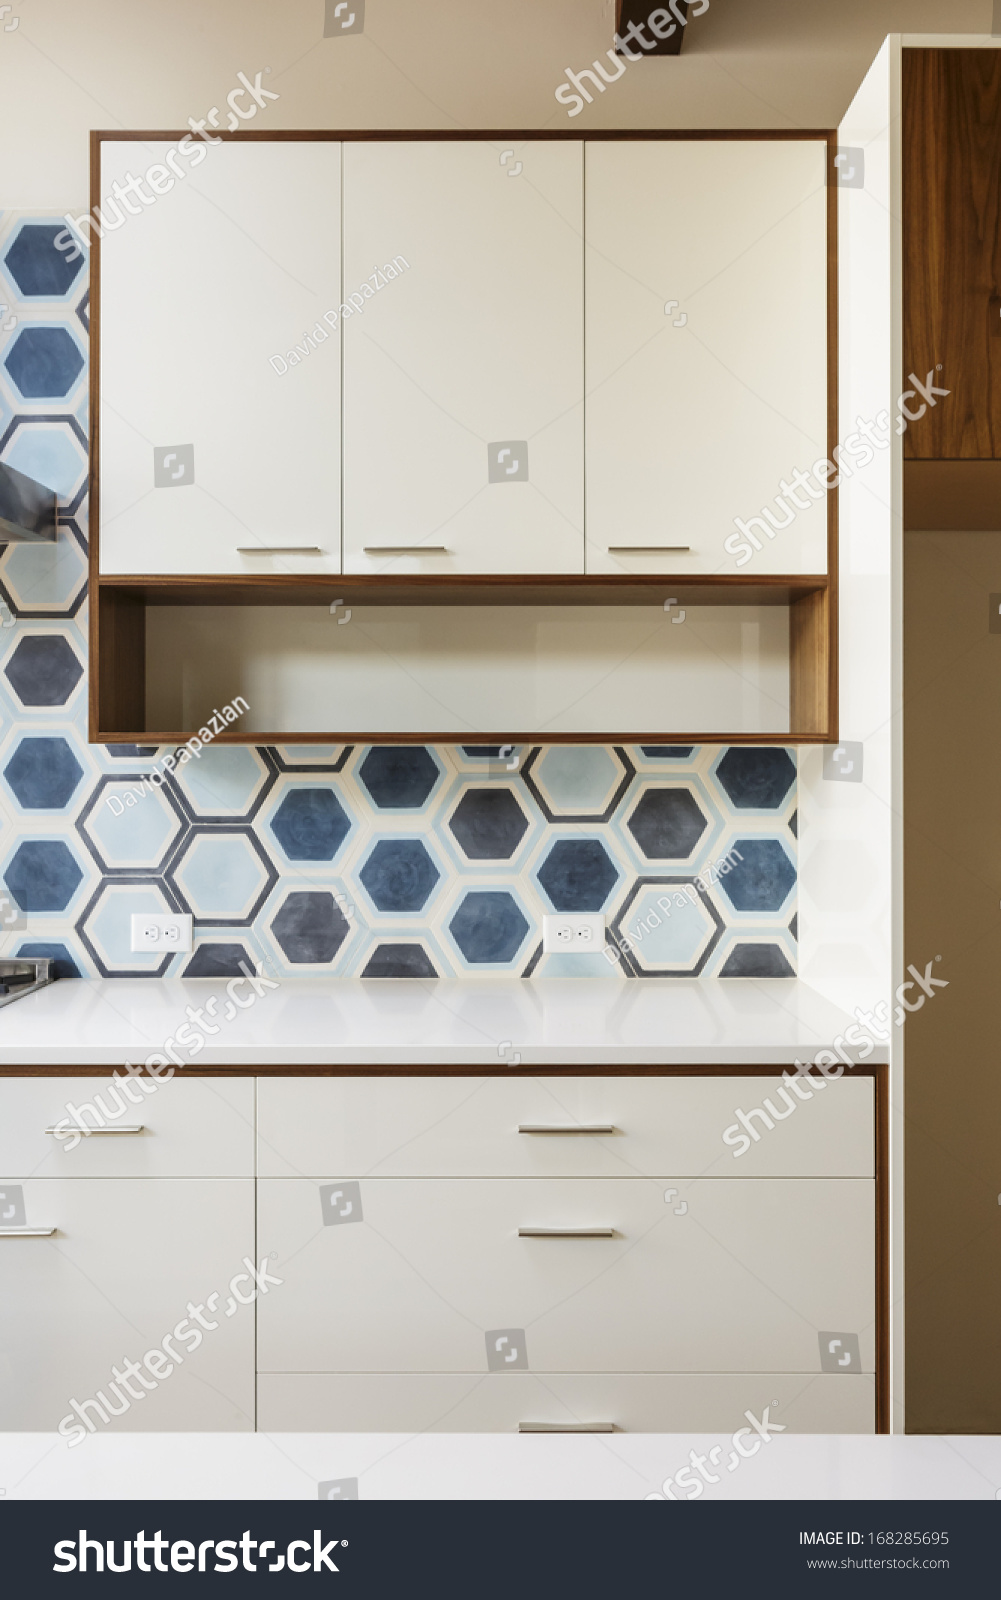 White Kitchen Cabinets Wood Trim Hexagonal Stock Photo (Download Now ...